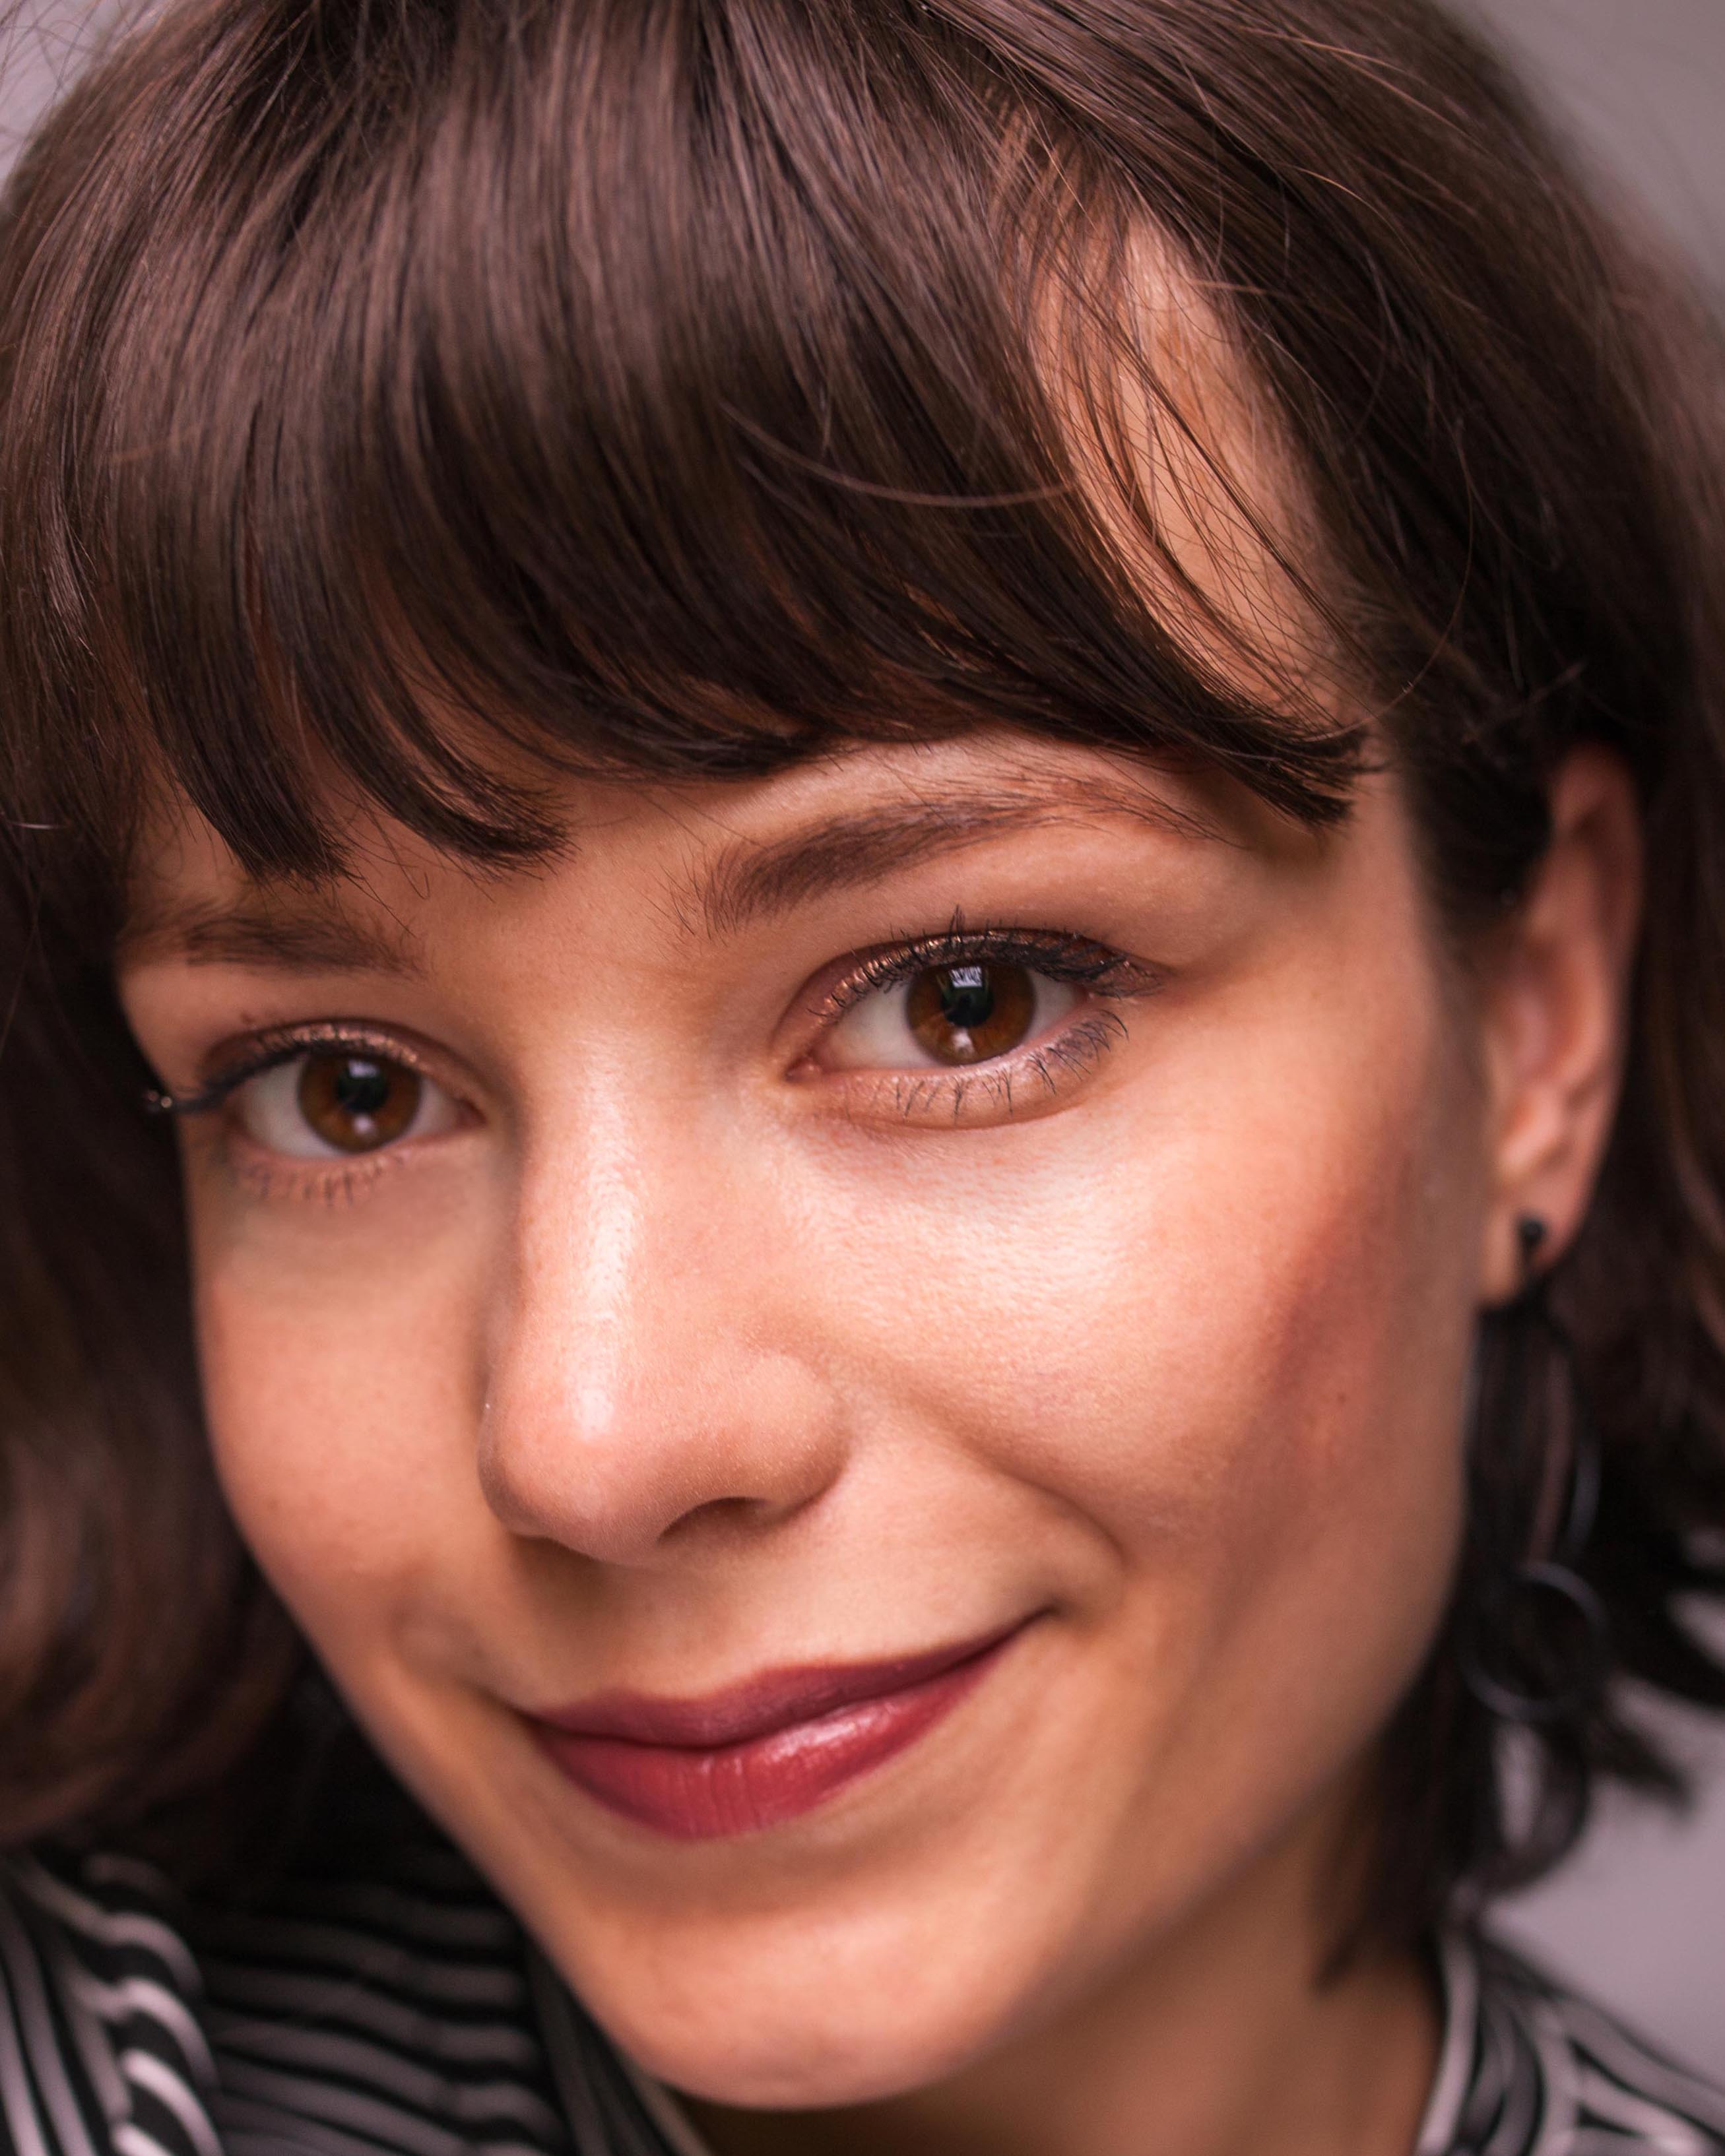 Anna Jelínková